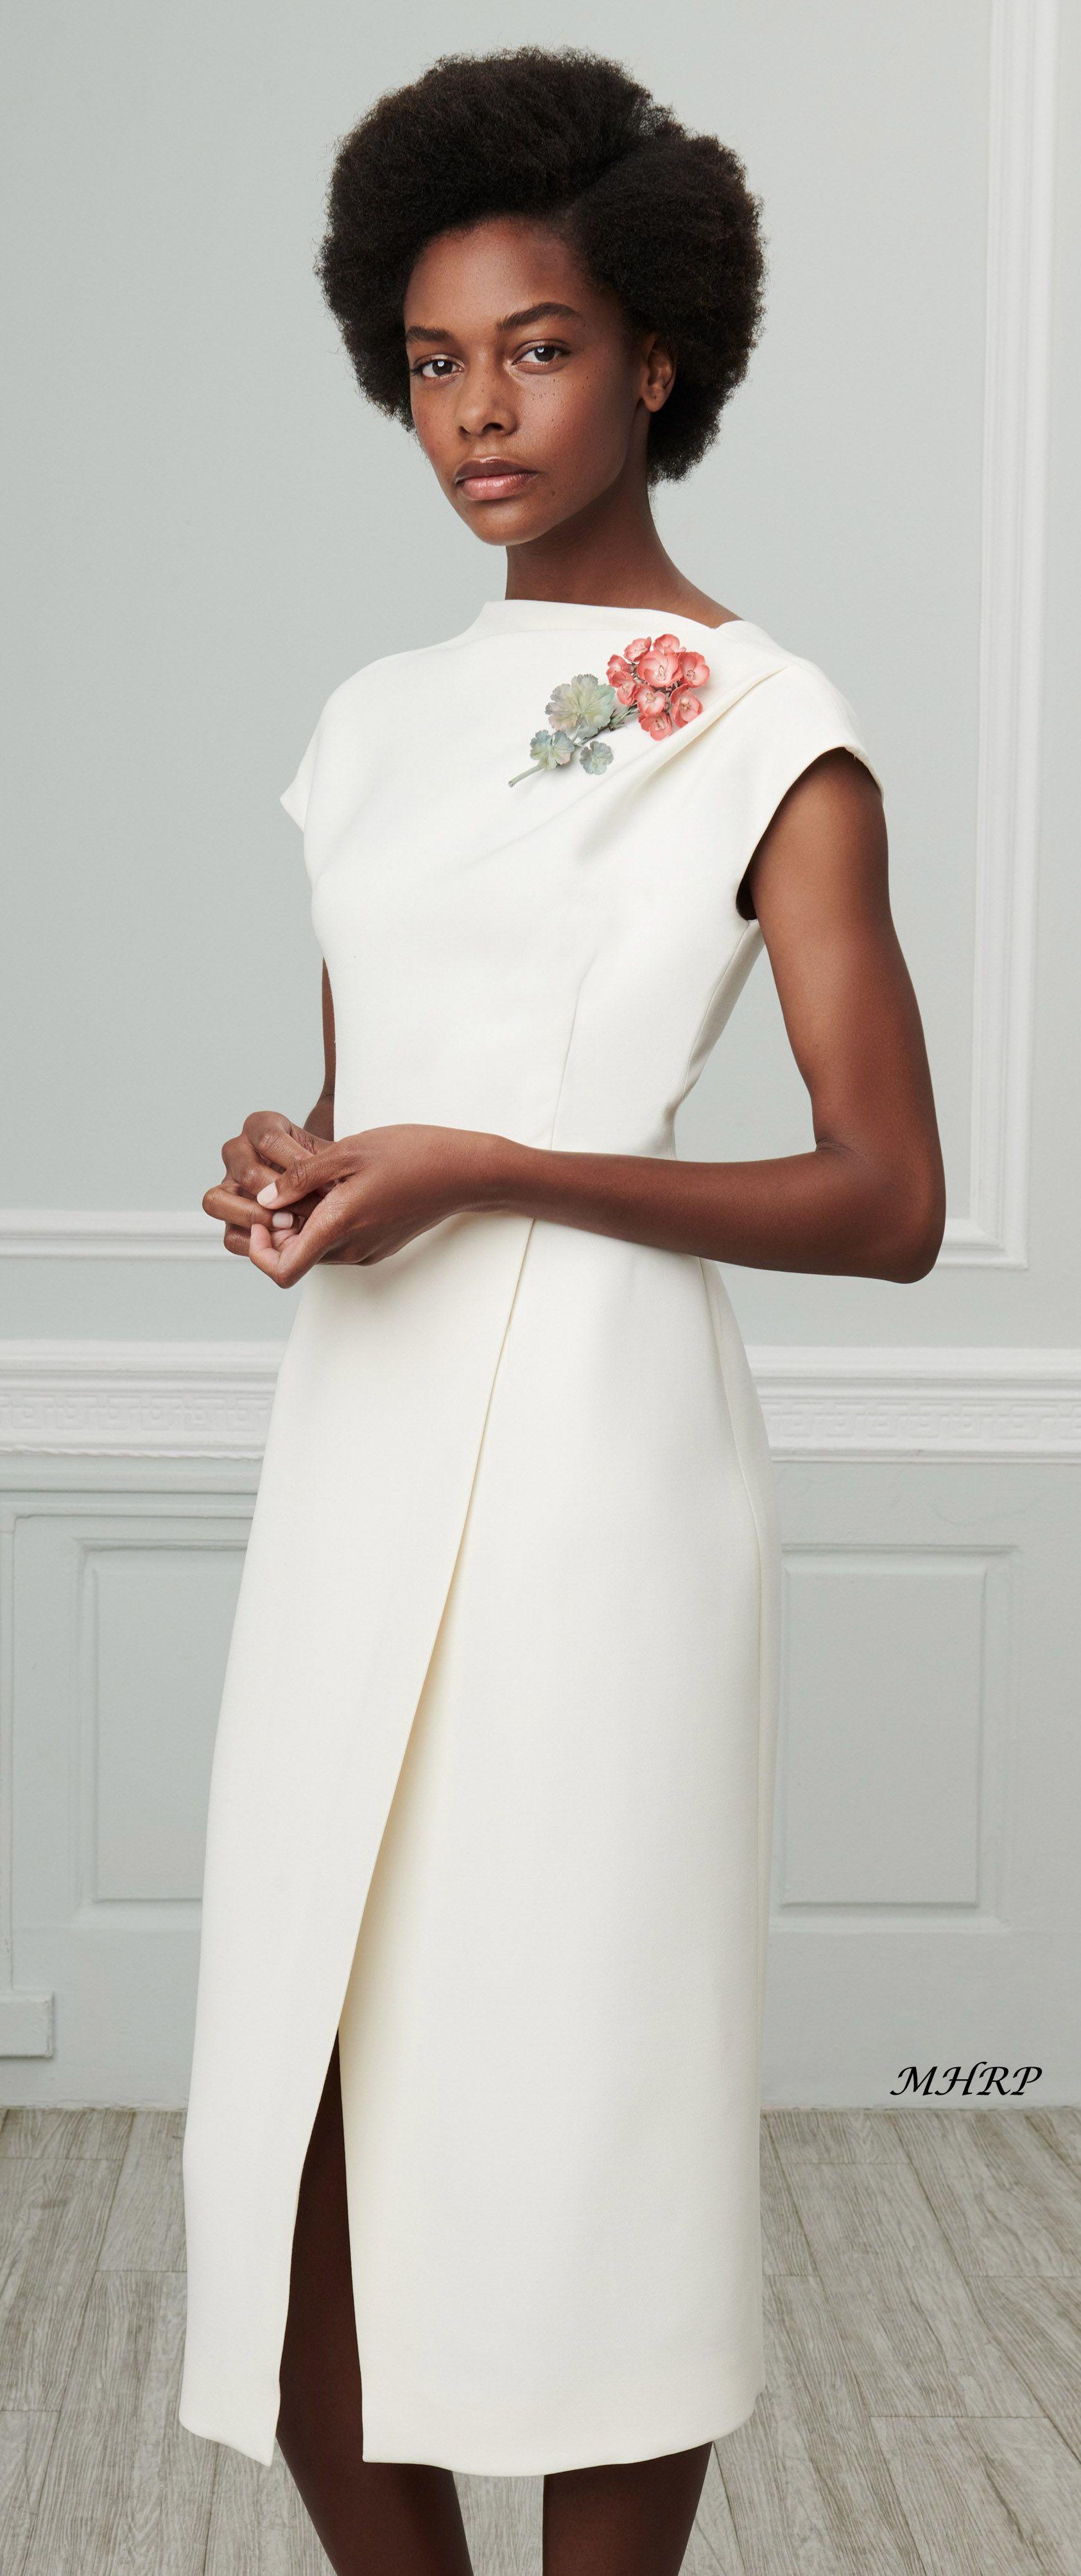 c2d7b3cd630b77 oscar-de-la-renta-vogue-resort-2019 | Sukienka | Dresses, Fashion i ...